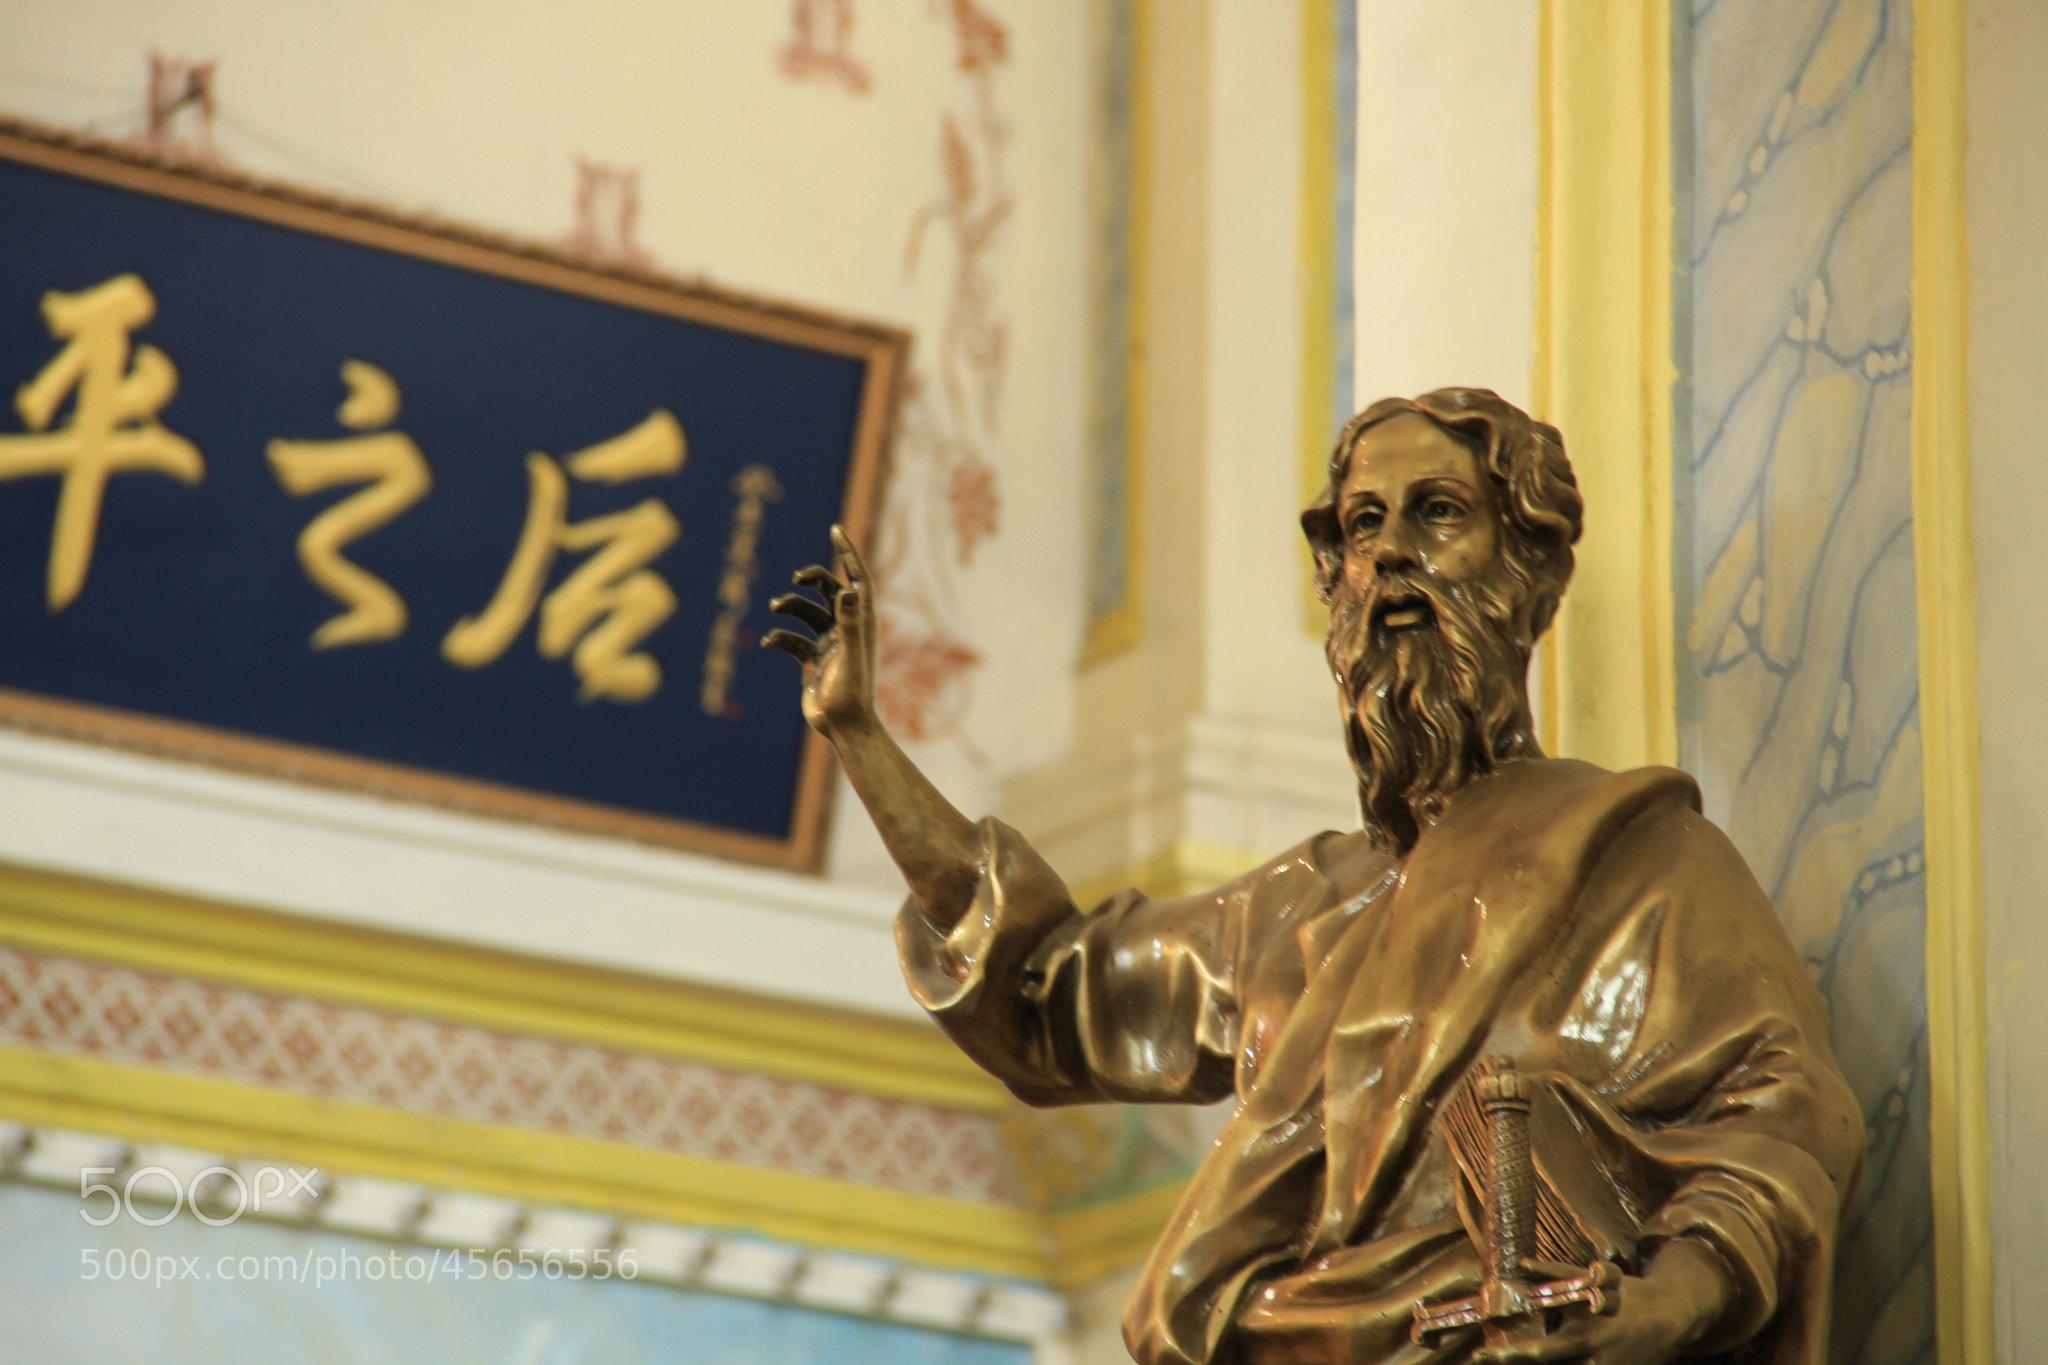 Photograph 西开教堂 天津 中国 by zhang sara on 500px